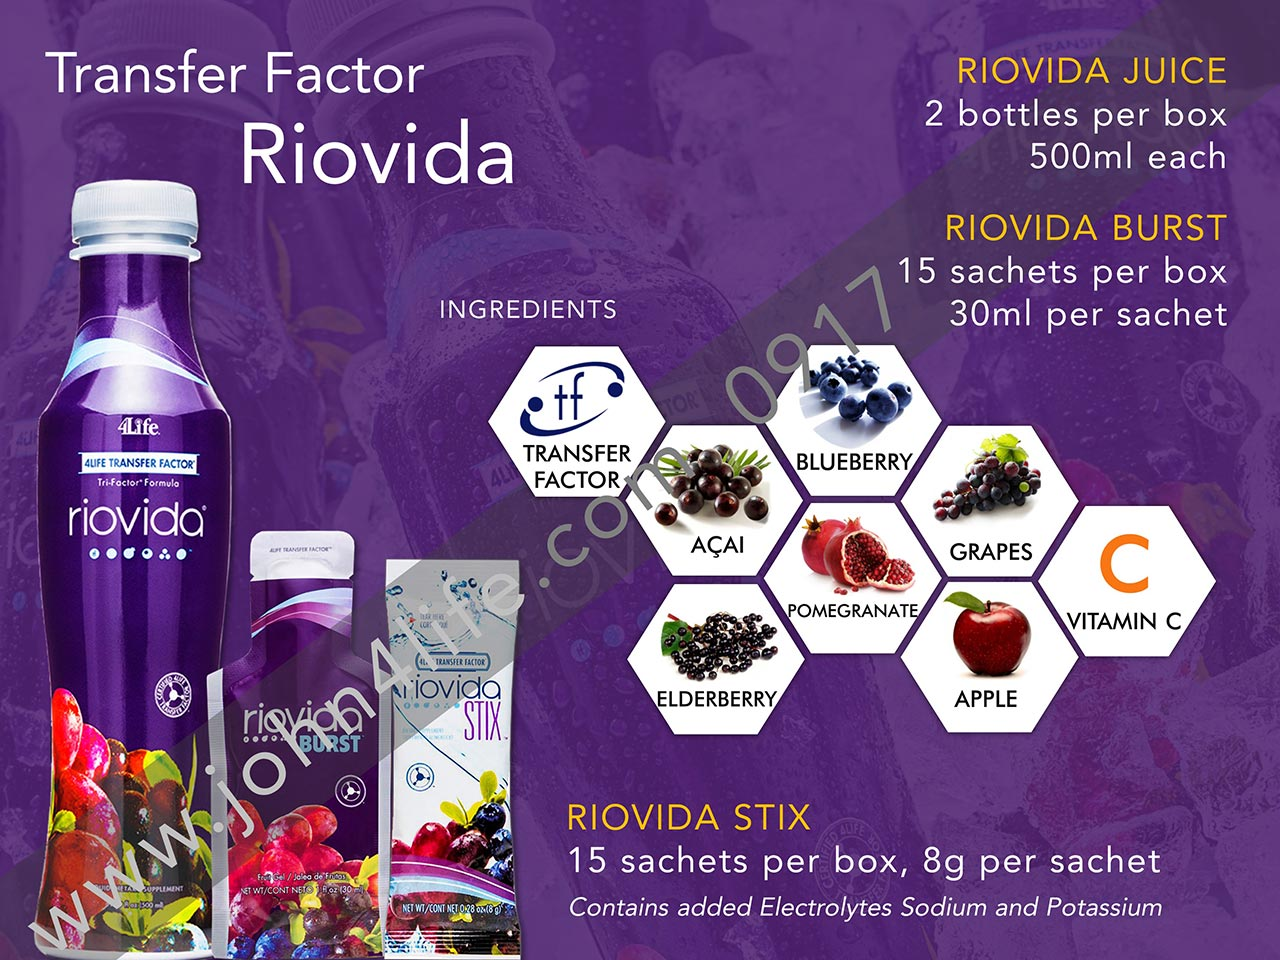 riovida juice, burst, stix, acai berry, vitamin c